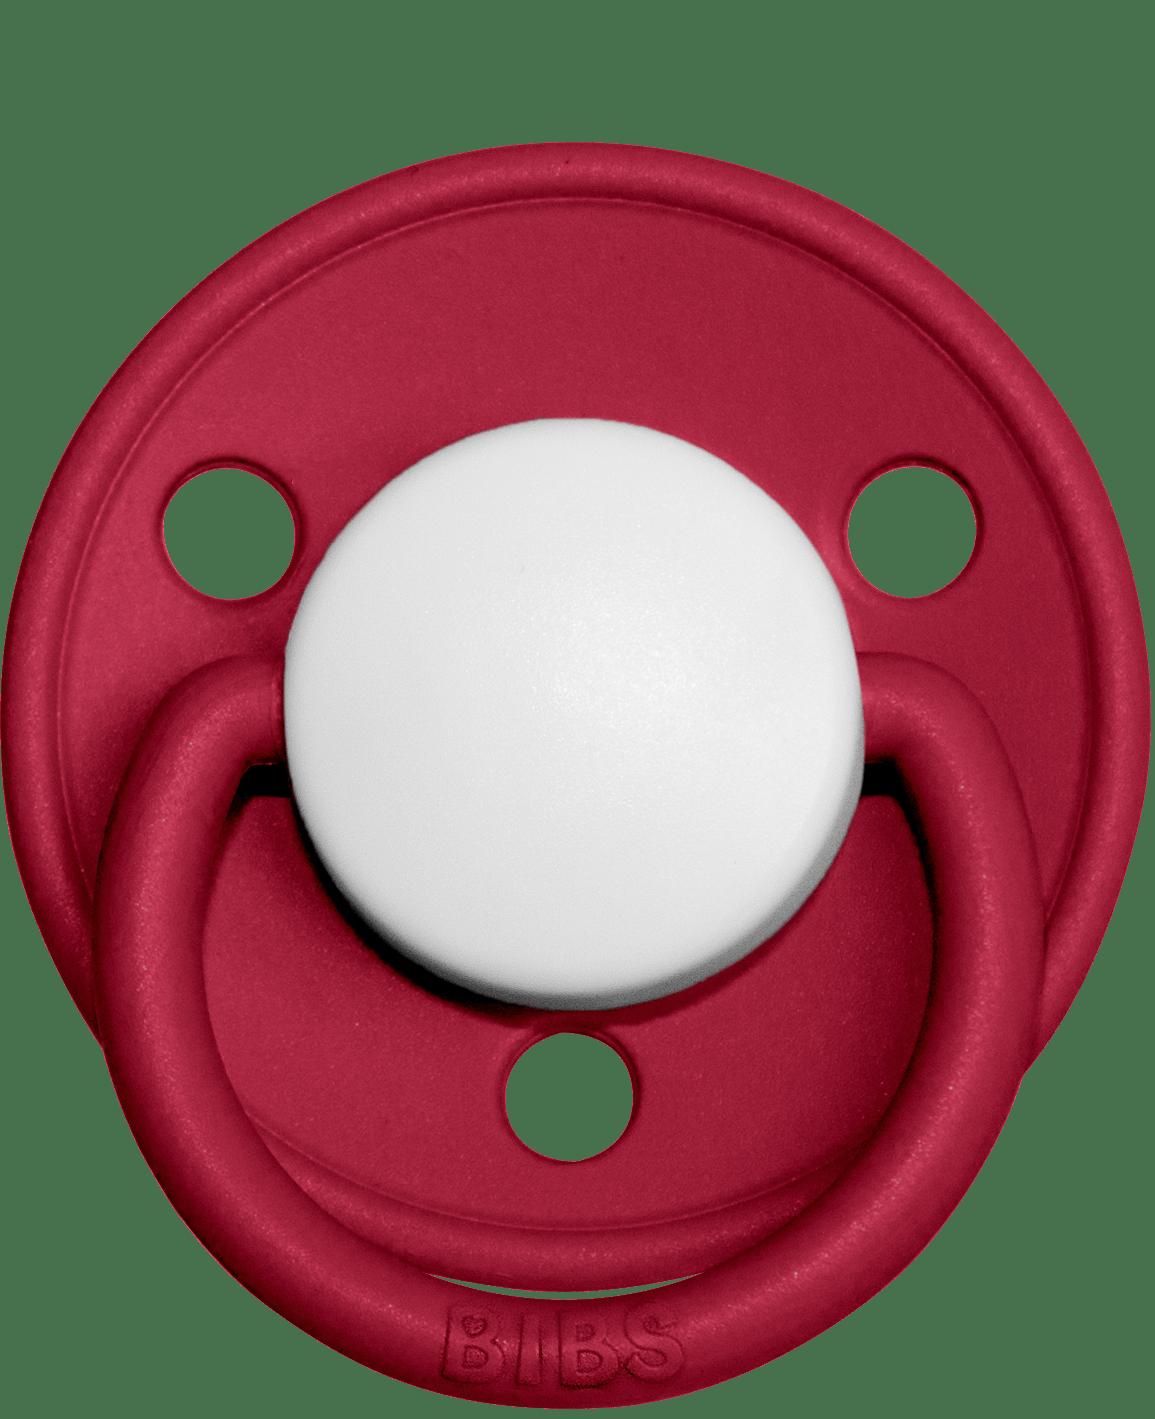 Ruby-43 - Silicone